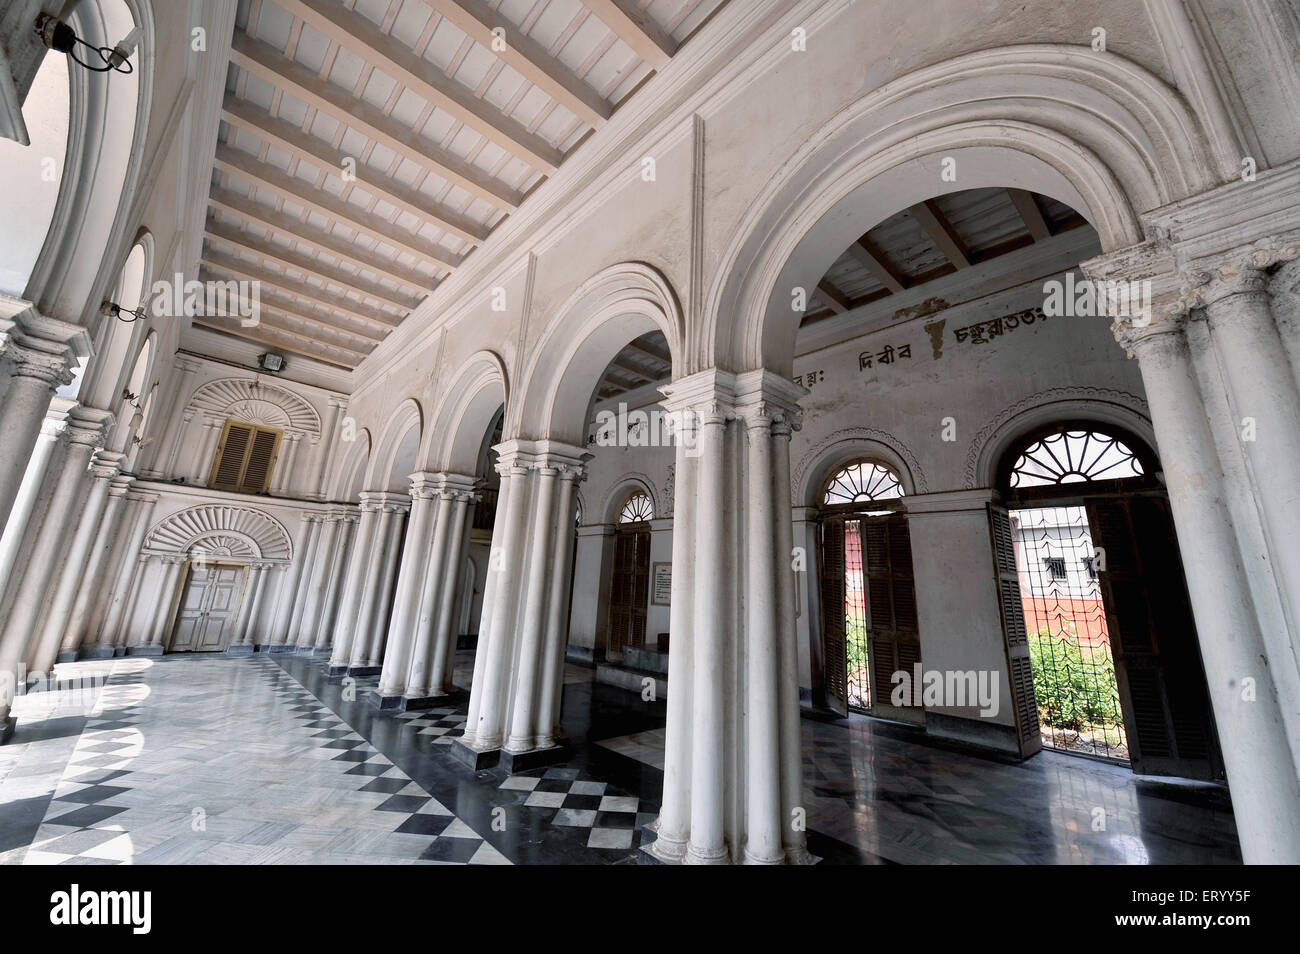 Jorasanko thakur bari prayer hall of poet rabindranath tagore Kolkata ; Calcutta ; India - Stock Image